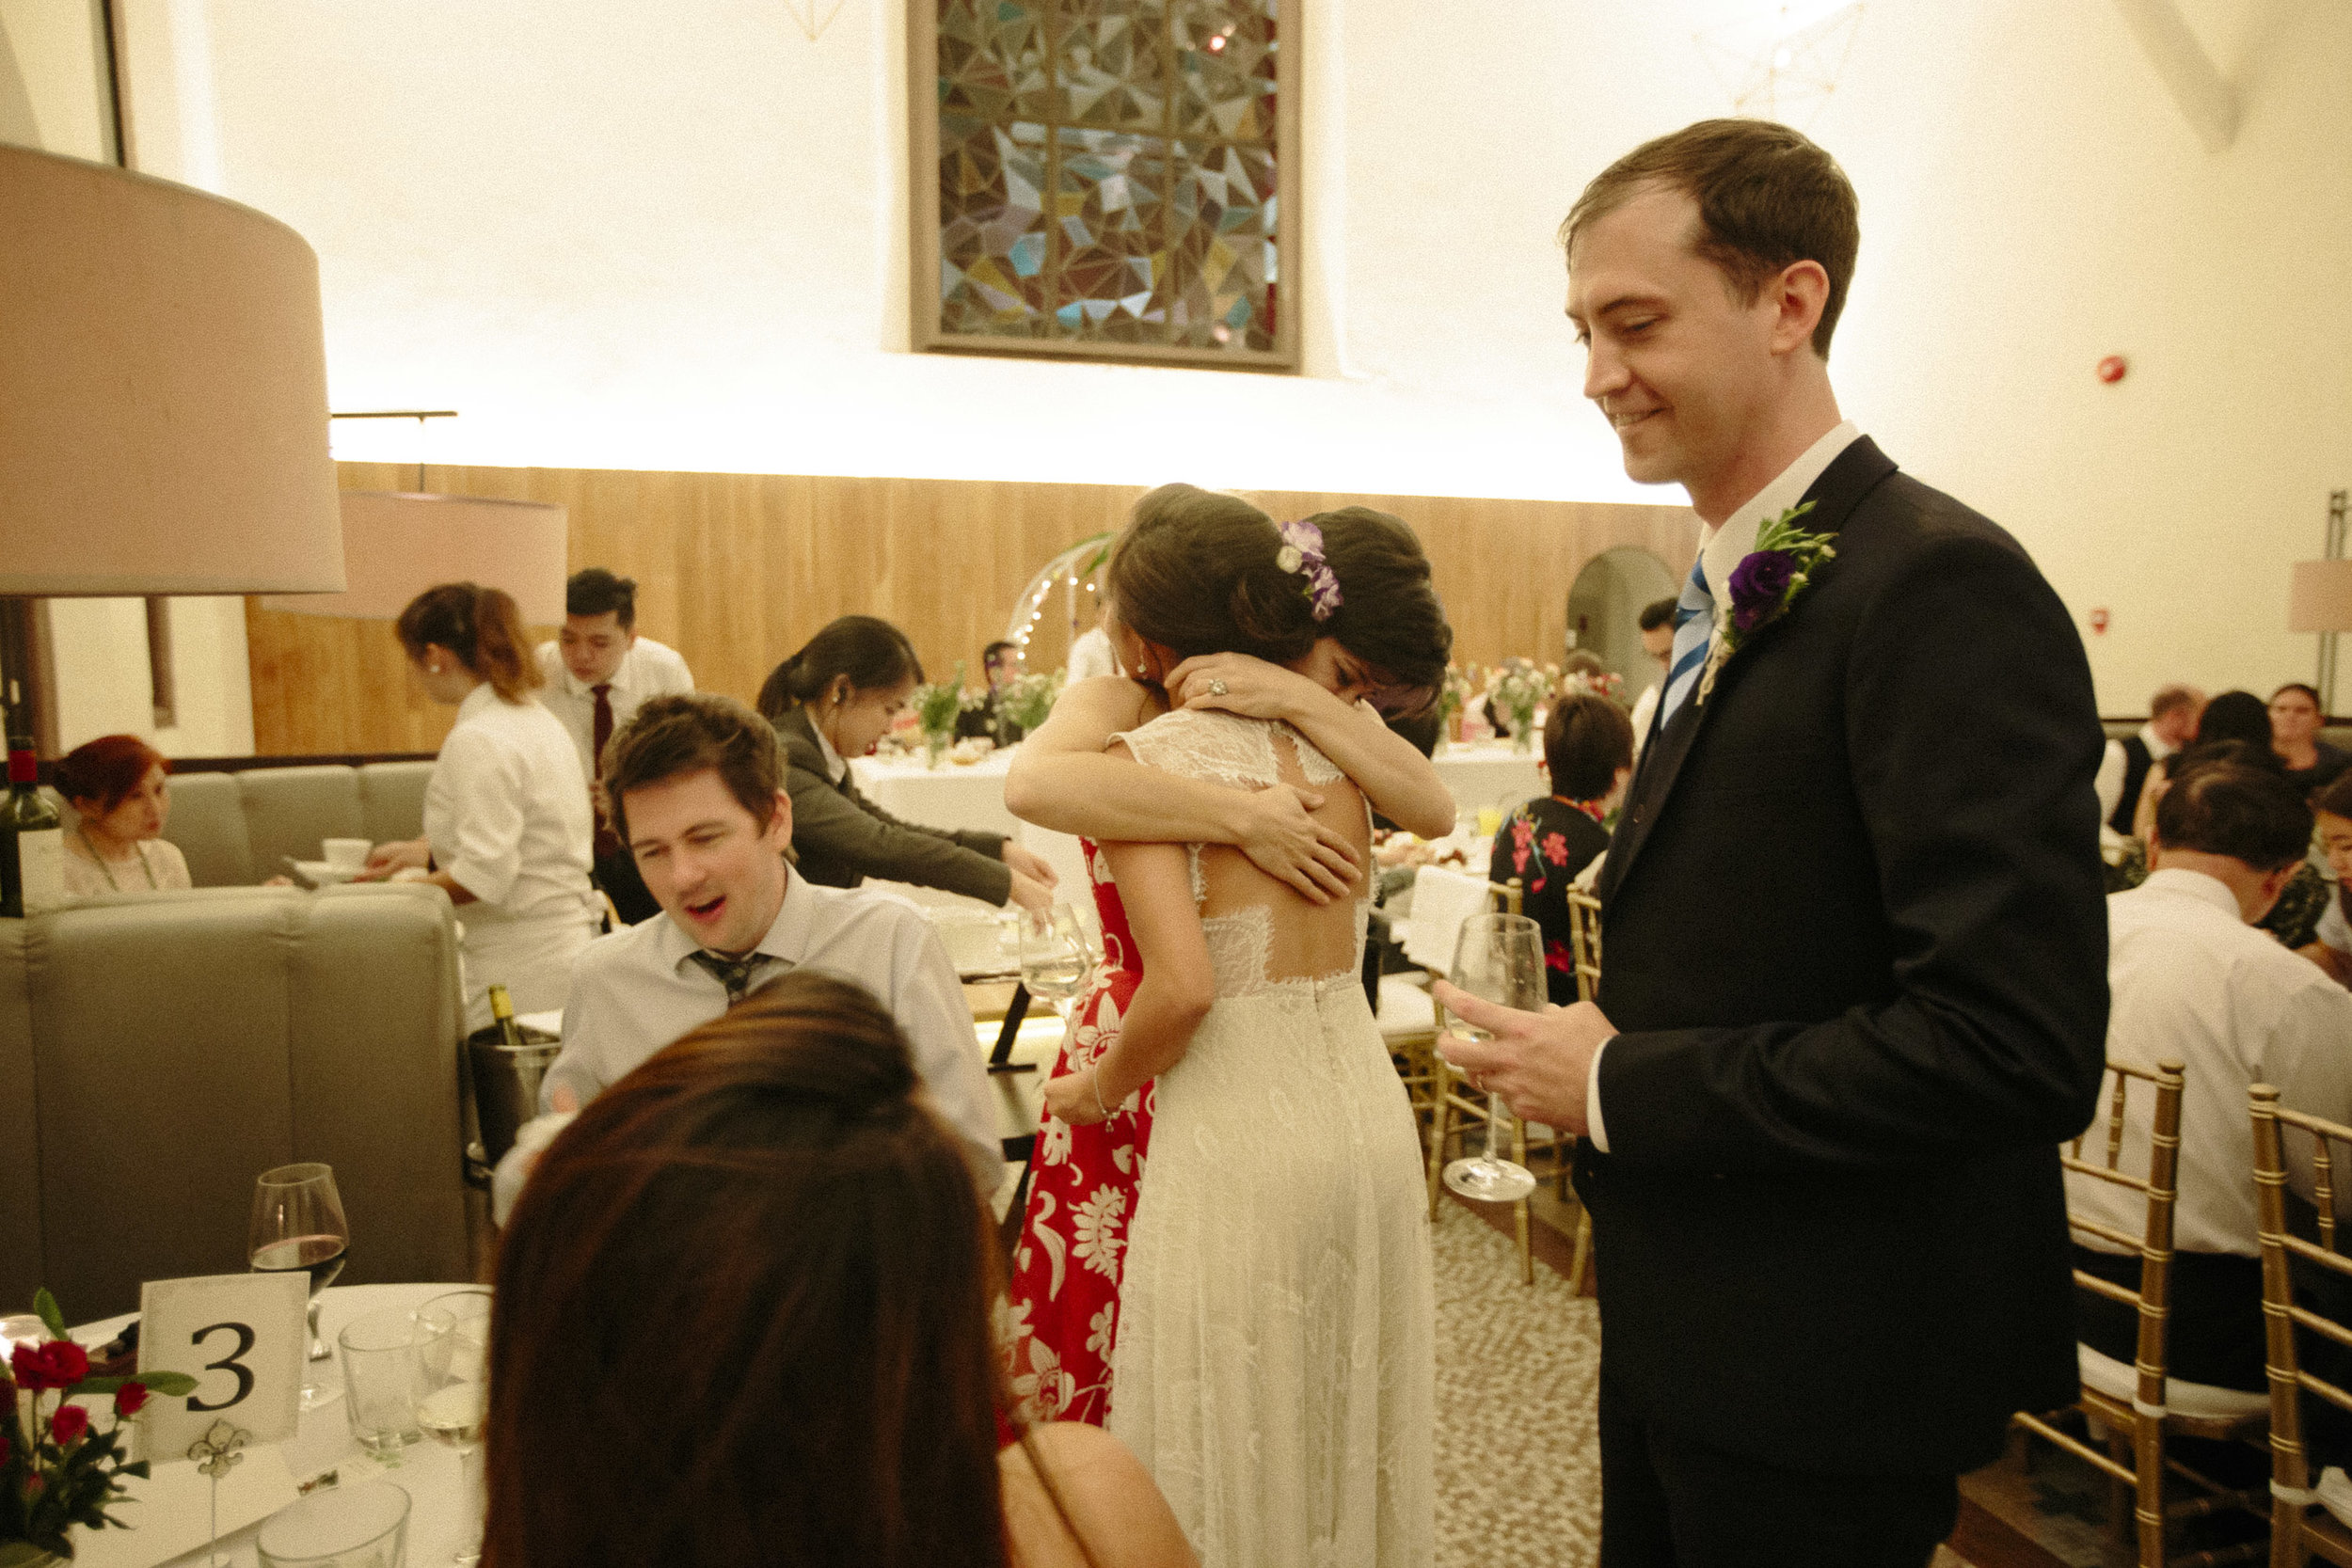 singapore-wedding-photographer-hiram-joyce-074.jpg